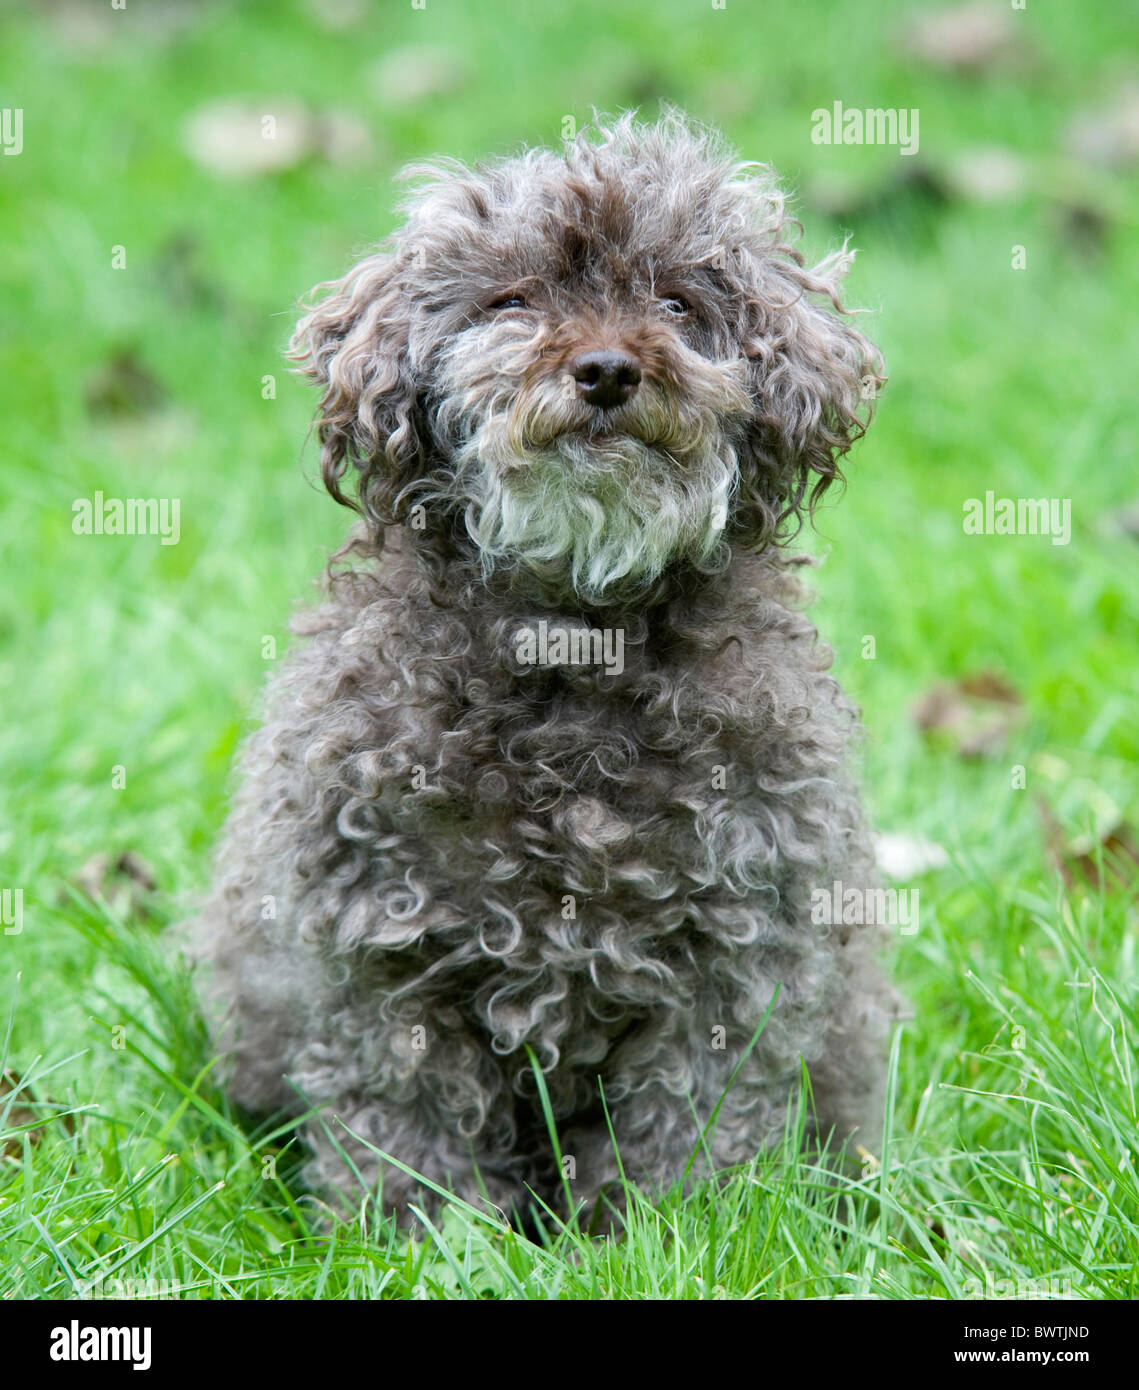 Teddy Bear Dog Shih Tzu Cross Bichon Frise Uk Stock Photo 33118329